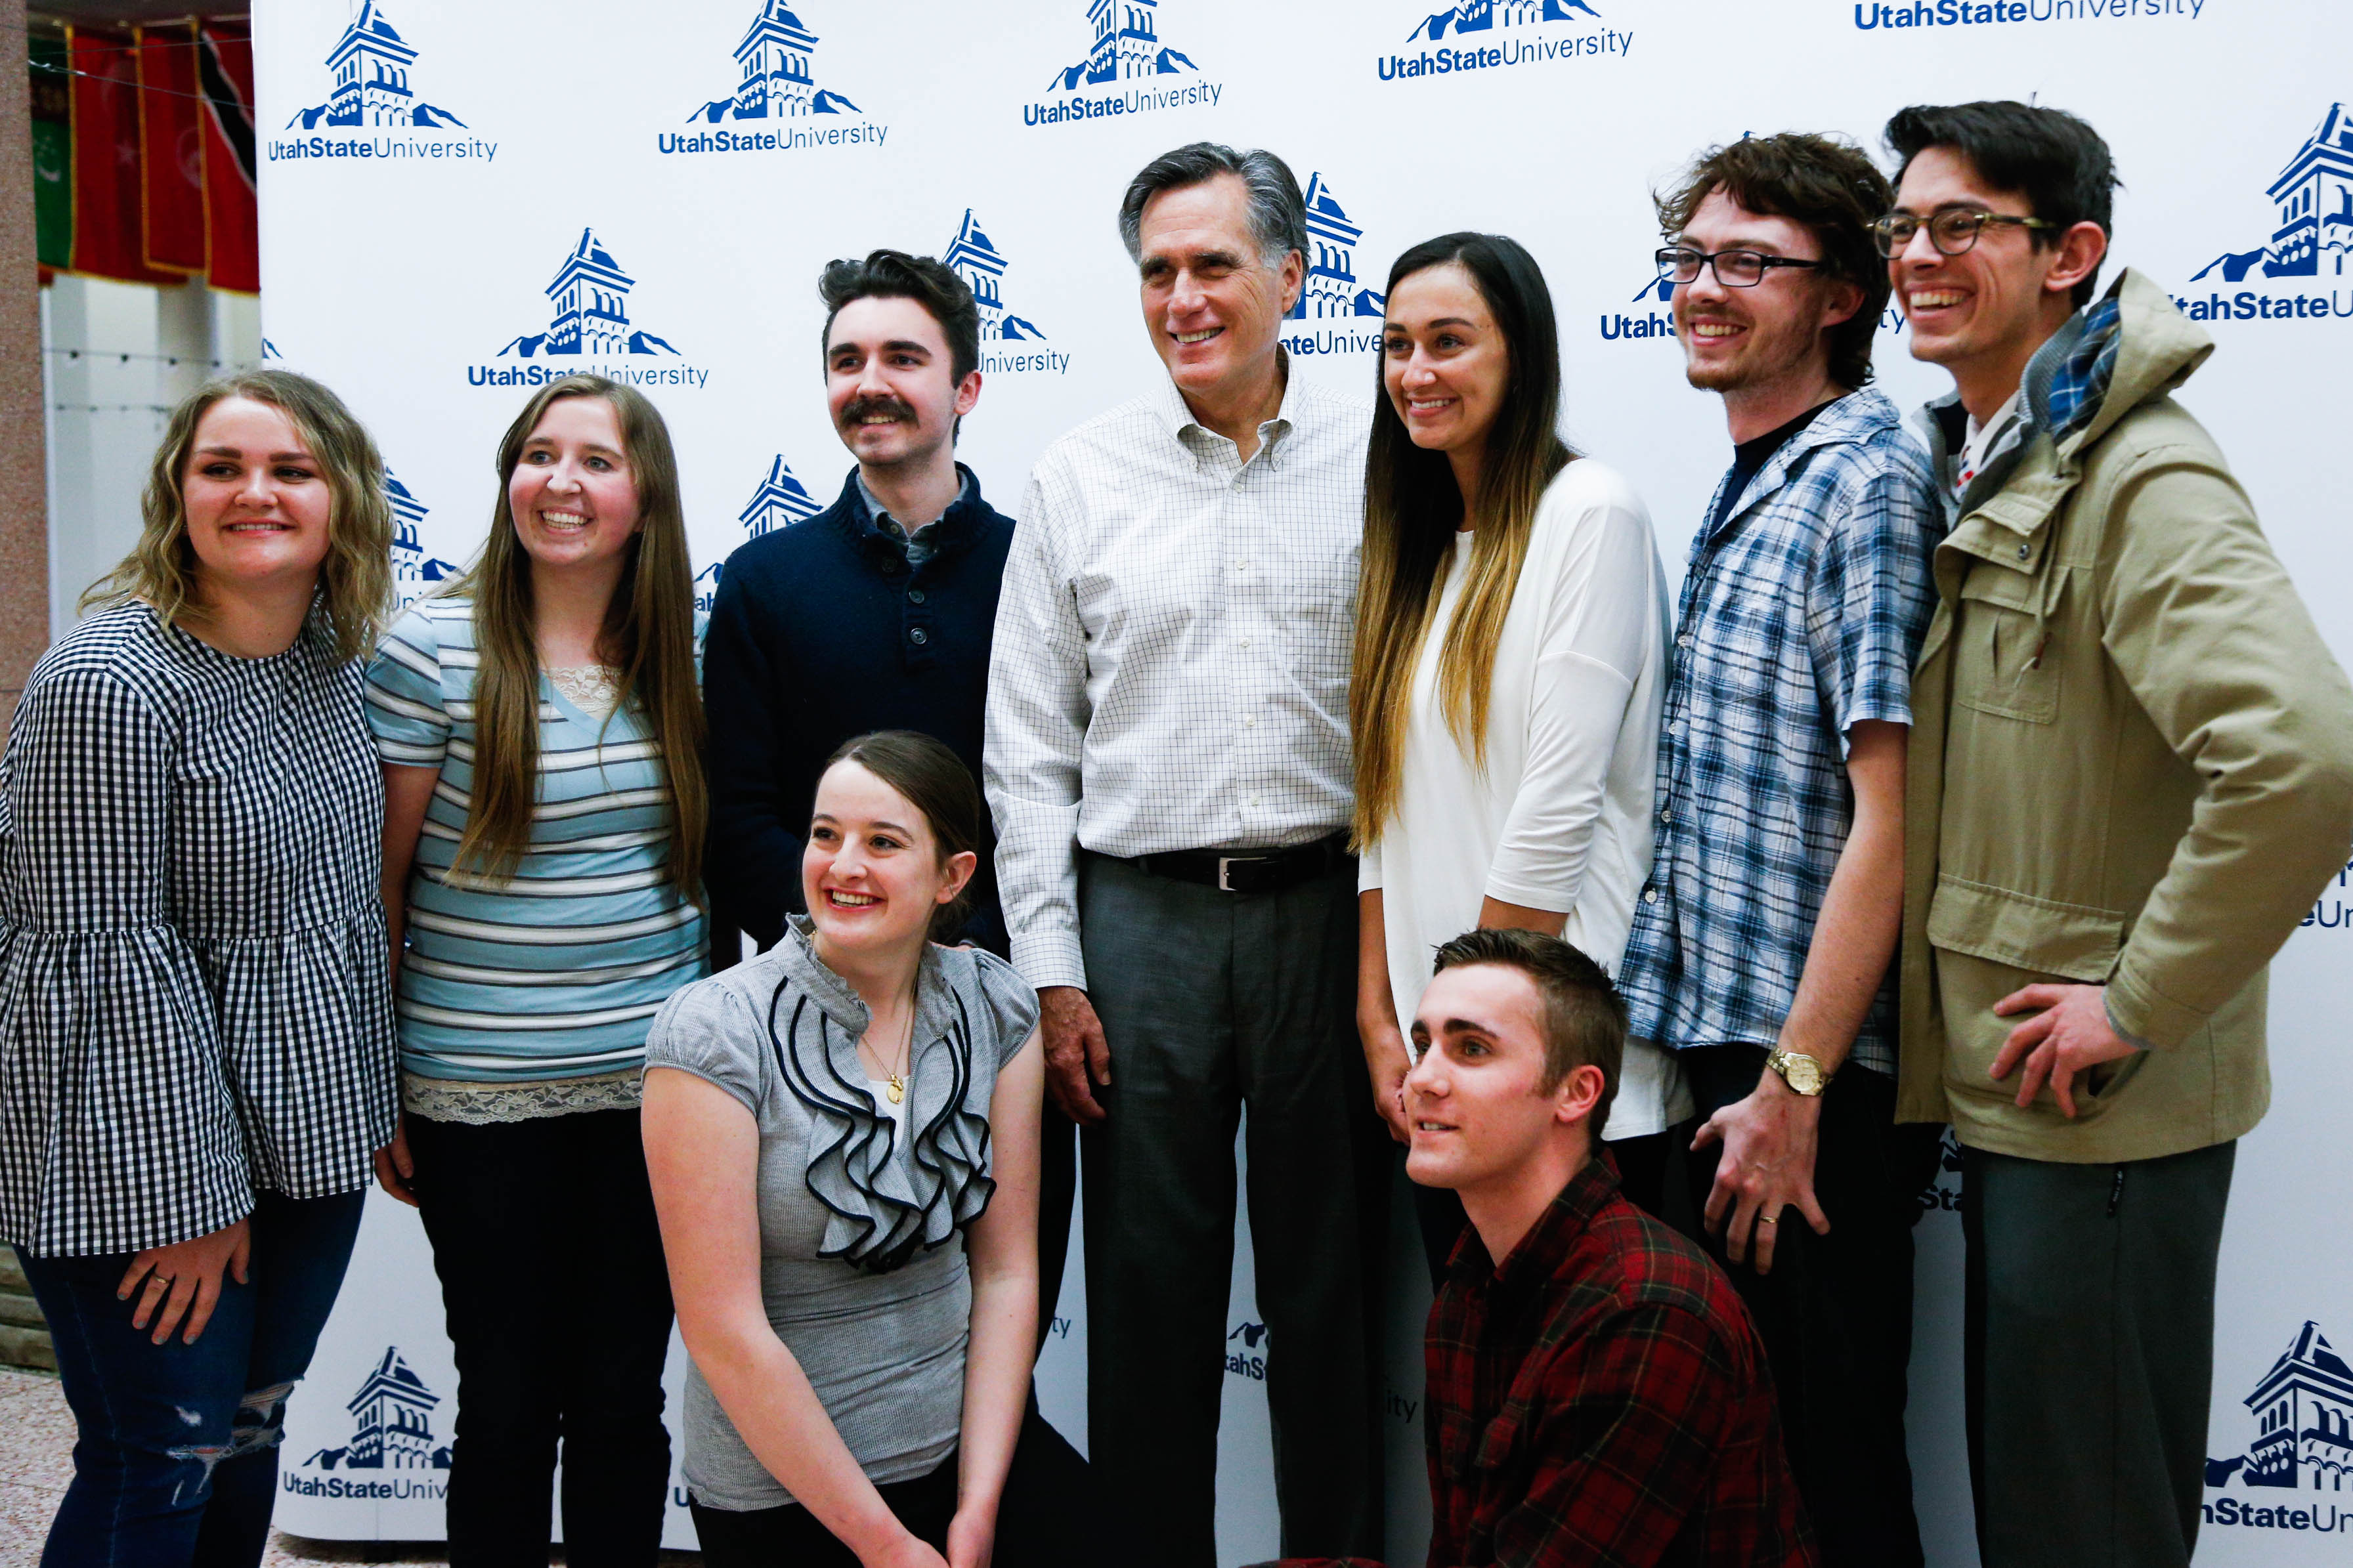 Mitt Romney Visits Usu Read Qa Here The Utah Statesman